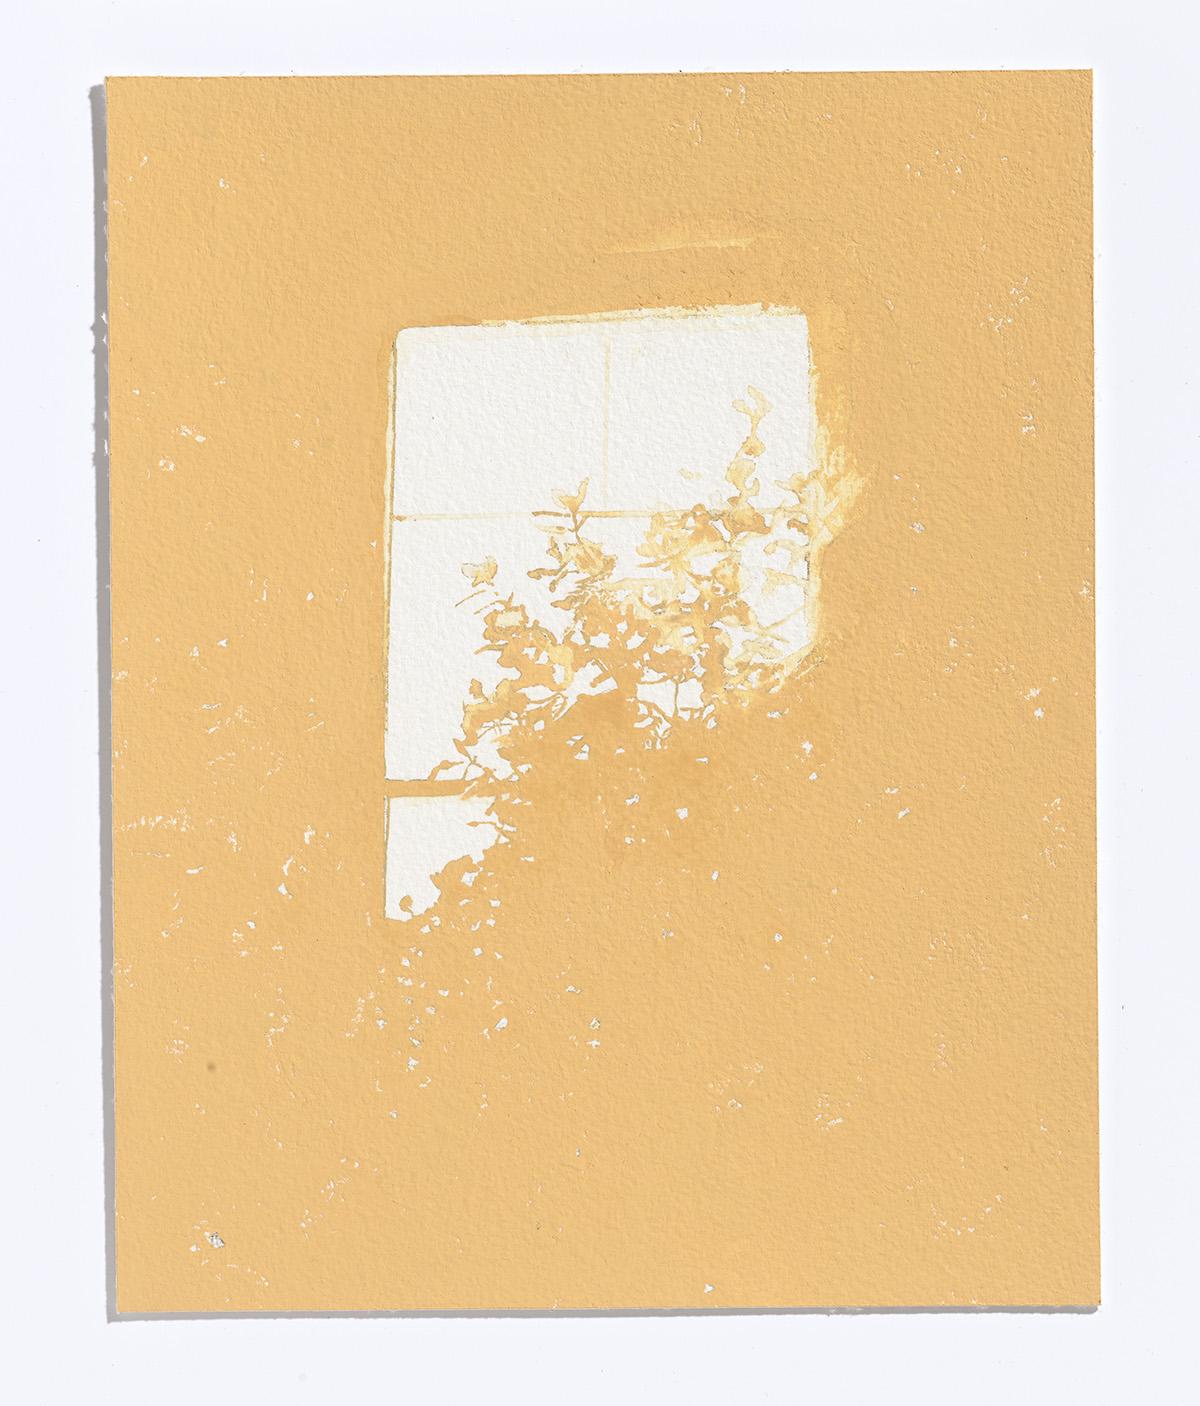 Pale Window, 2017, gouache on paper,10 1/8 x 8 in.$1100 CAD $900 USD